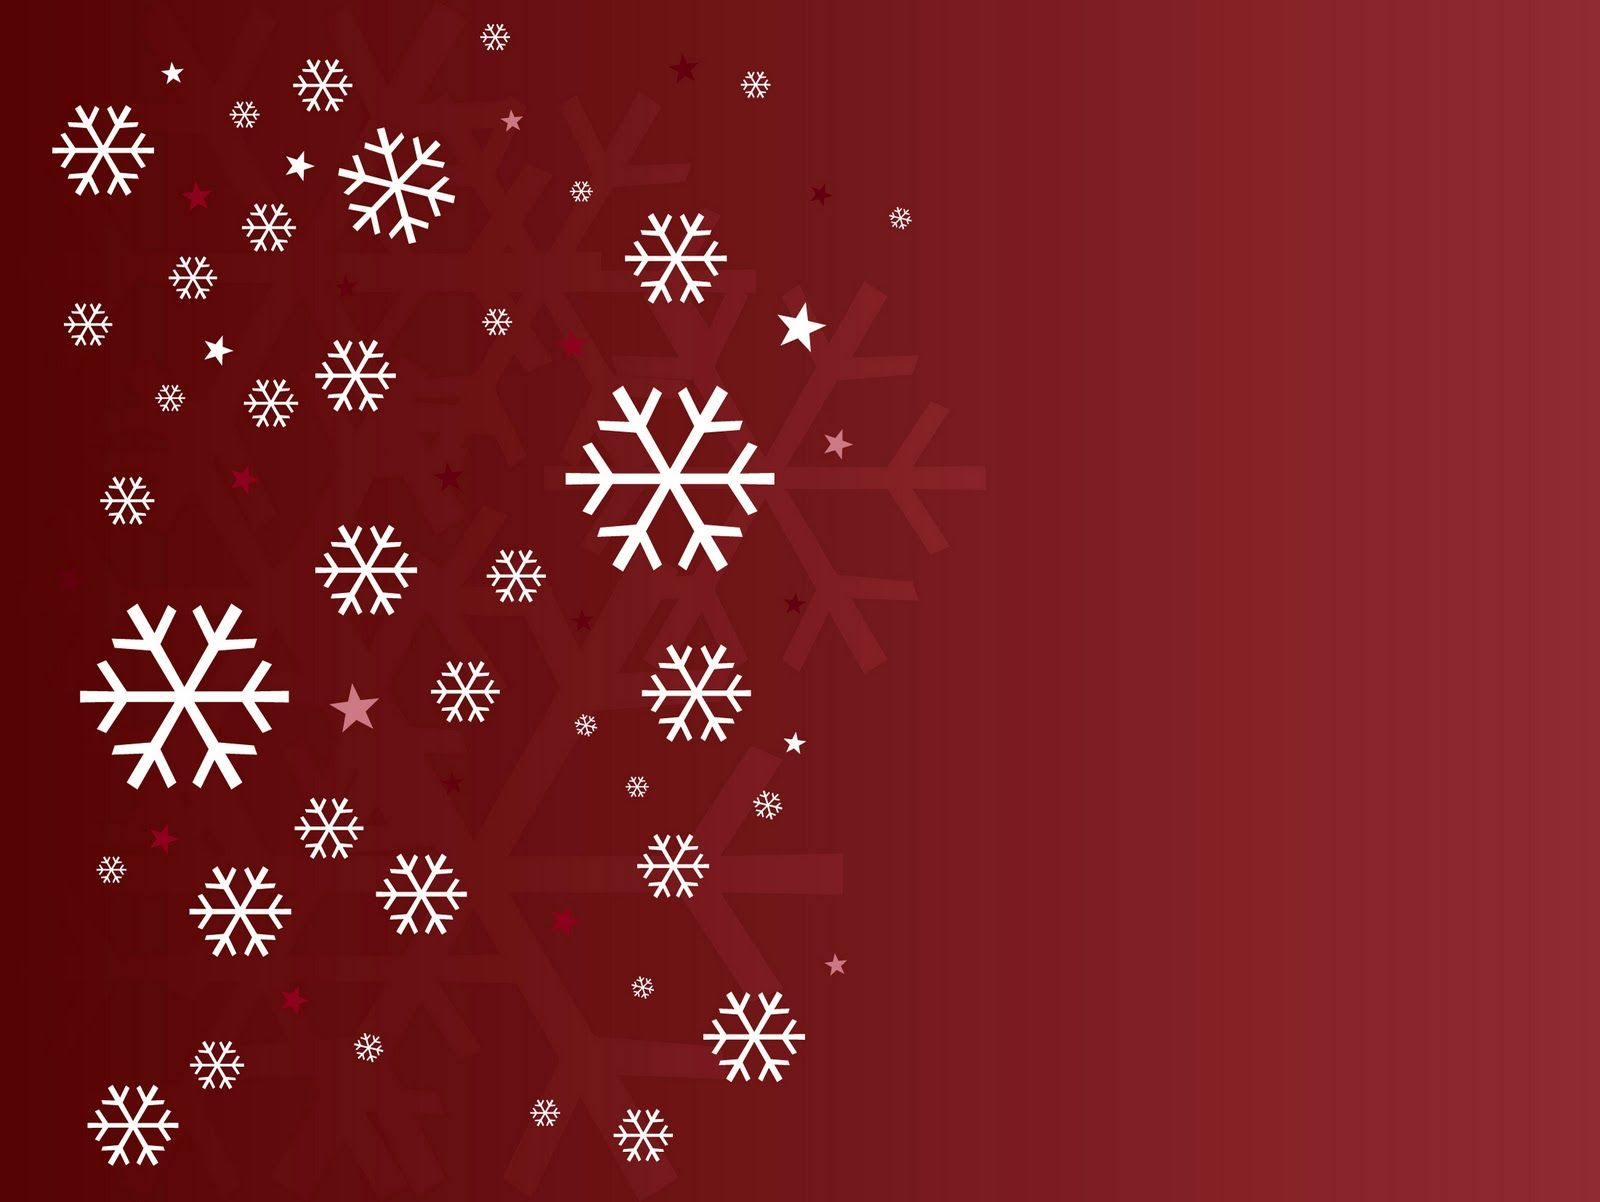 Fondos Navidad Animados: Fondos Navideños Animados Para Protector De Pantalla 8 HD